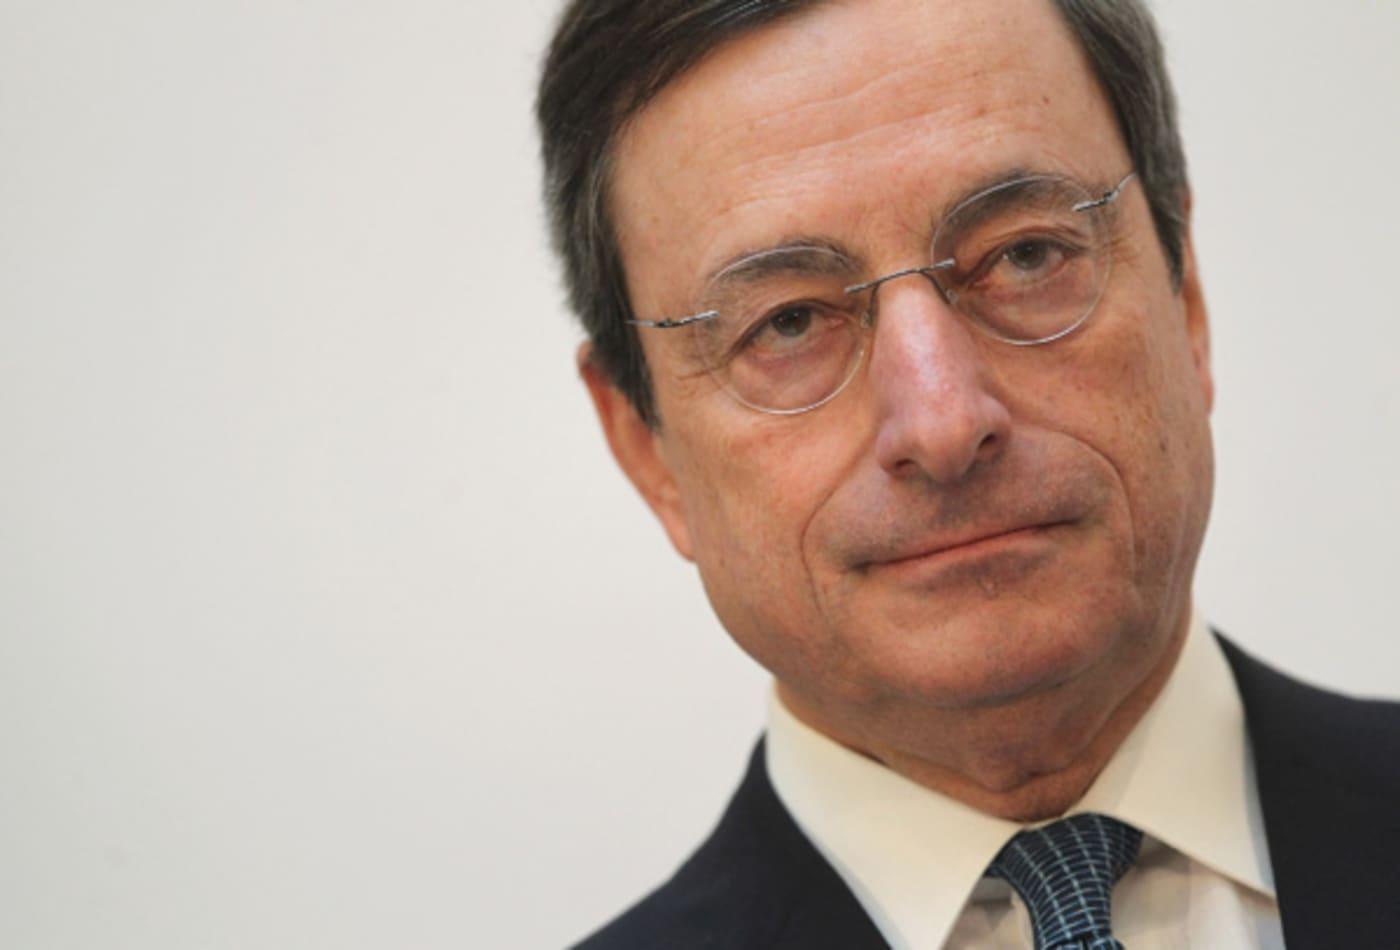 CNBC_Major_Events_Eurozone_Draghi.jpg